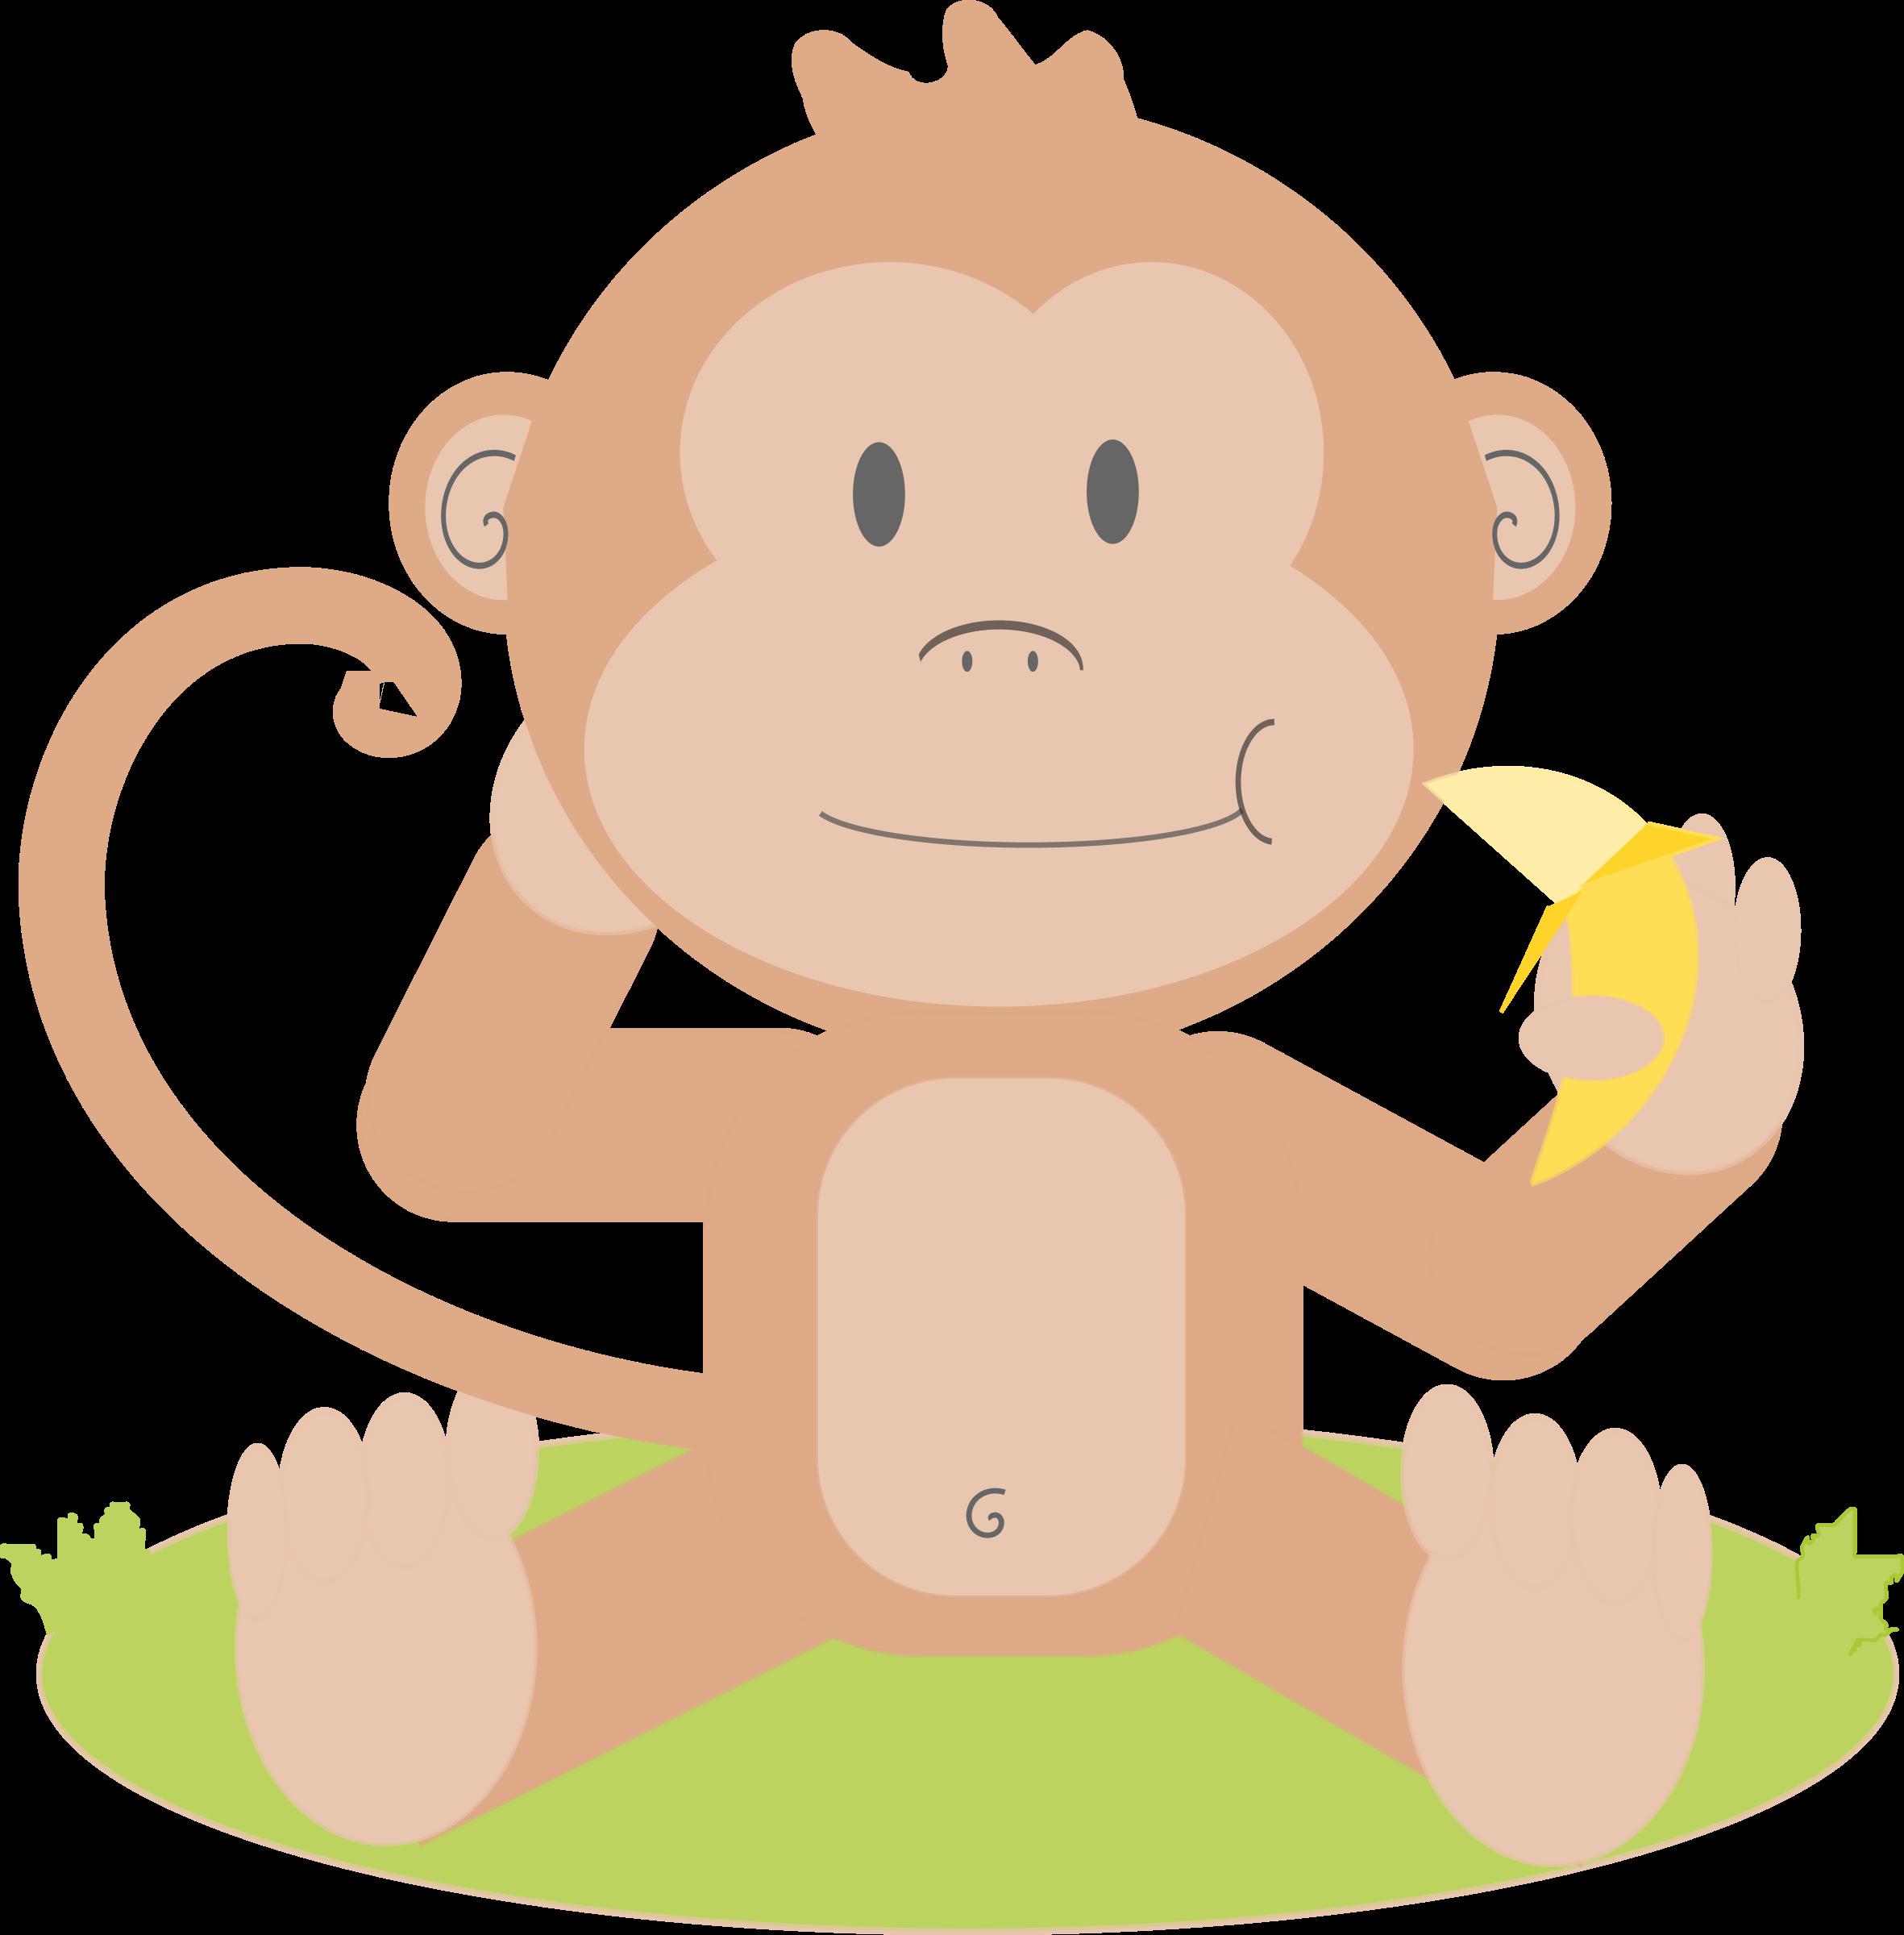 Monkeys clipart sign. Animated monkey log in